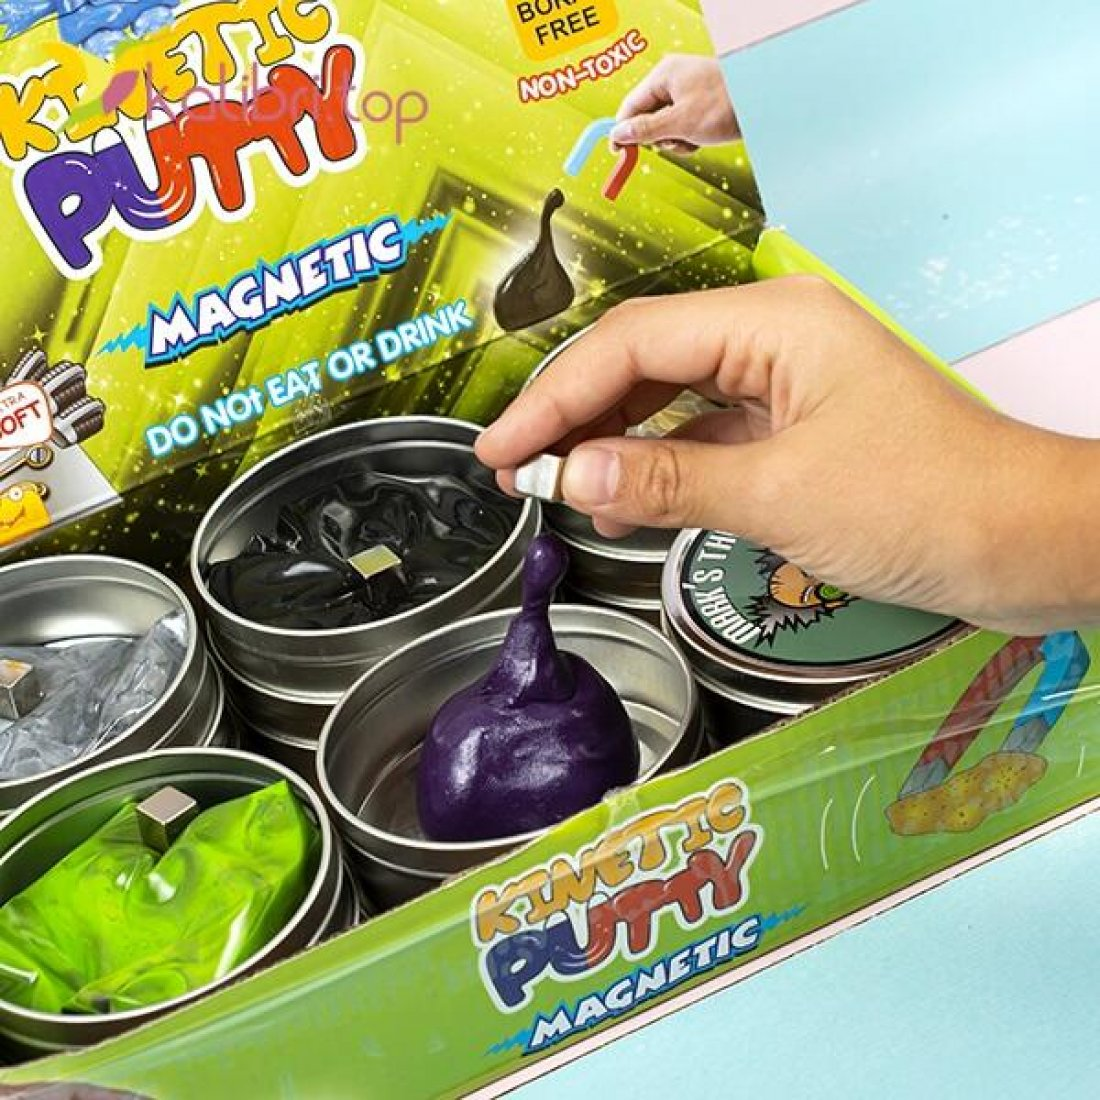 Жвачка для рук Kinetic Putty магнит оптом фото 01